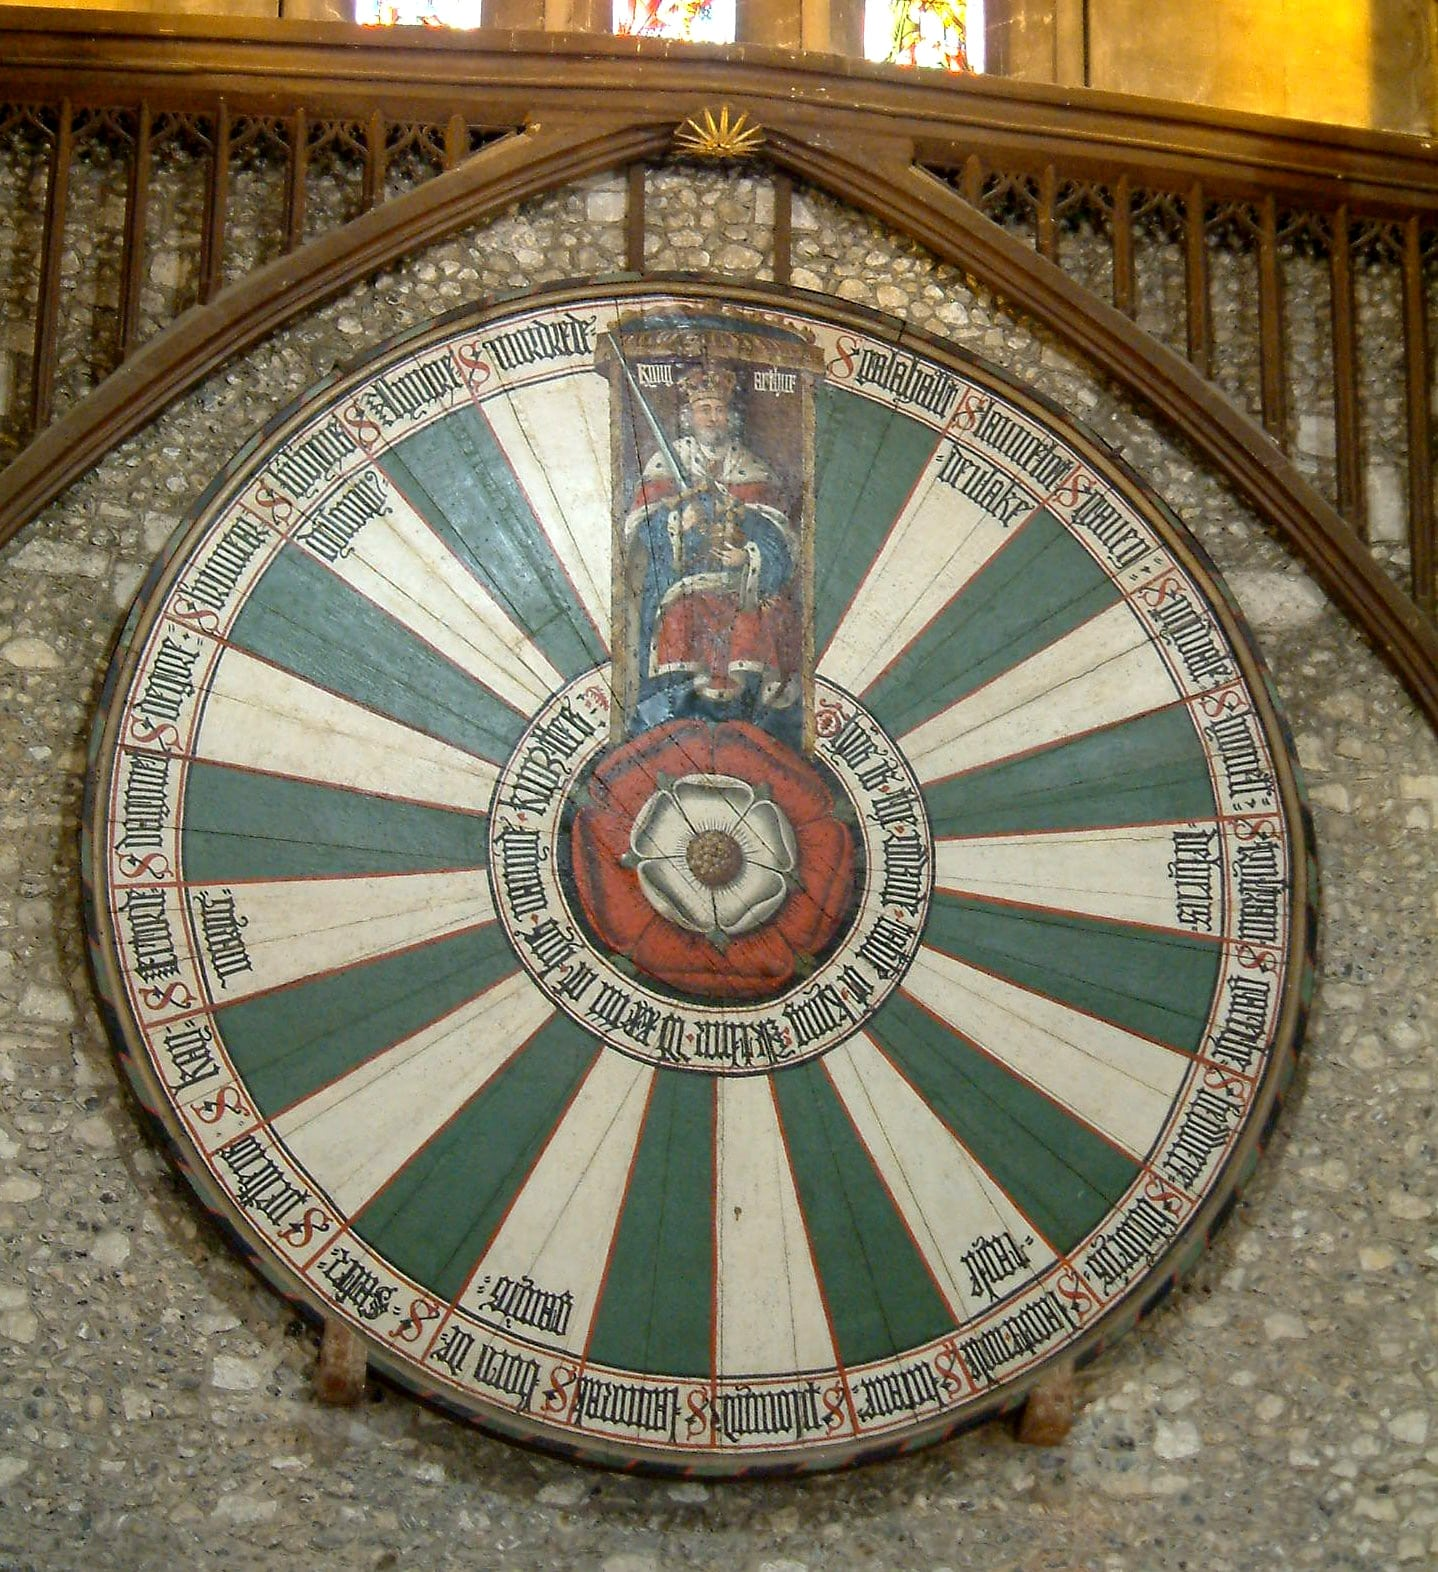 legende_arthur_table_ronde_moyen-age_central_popularite_medievale_mythe_arthurien